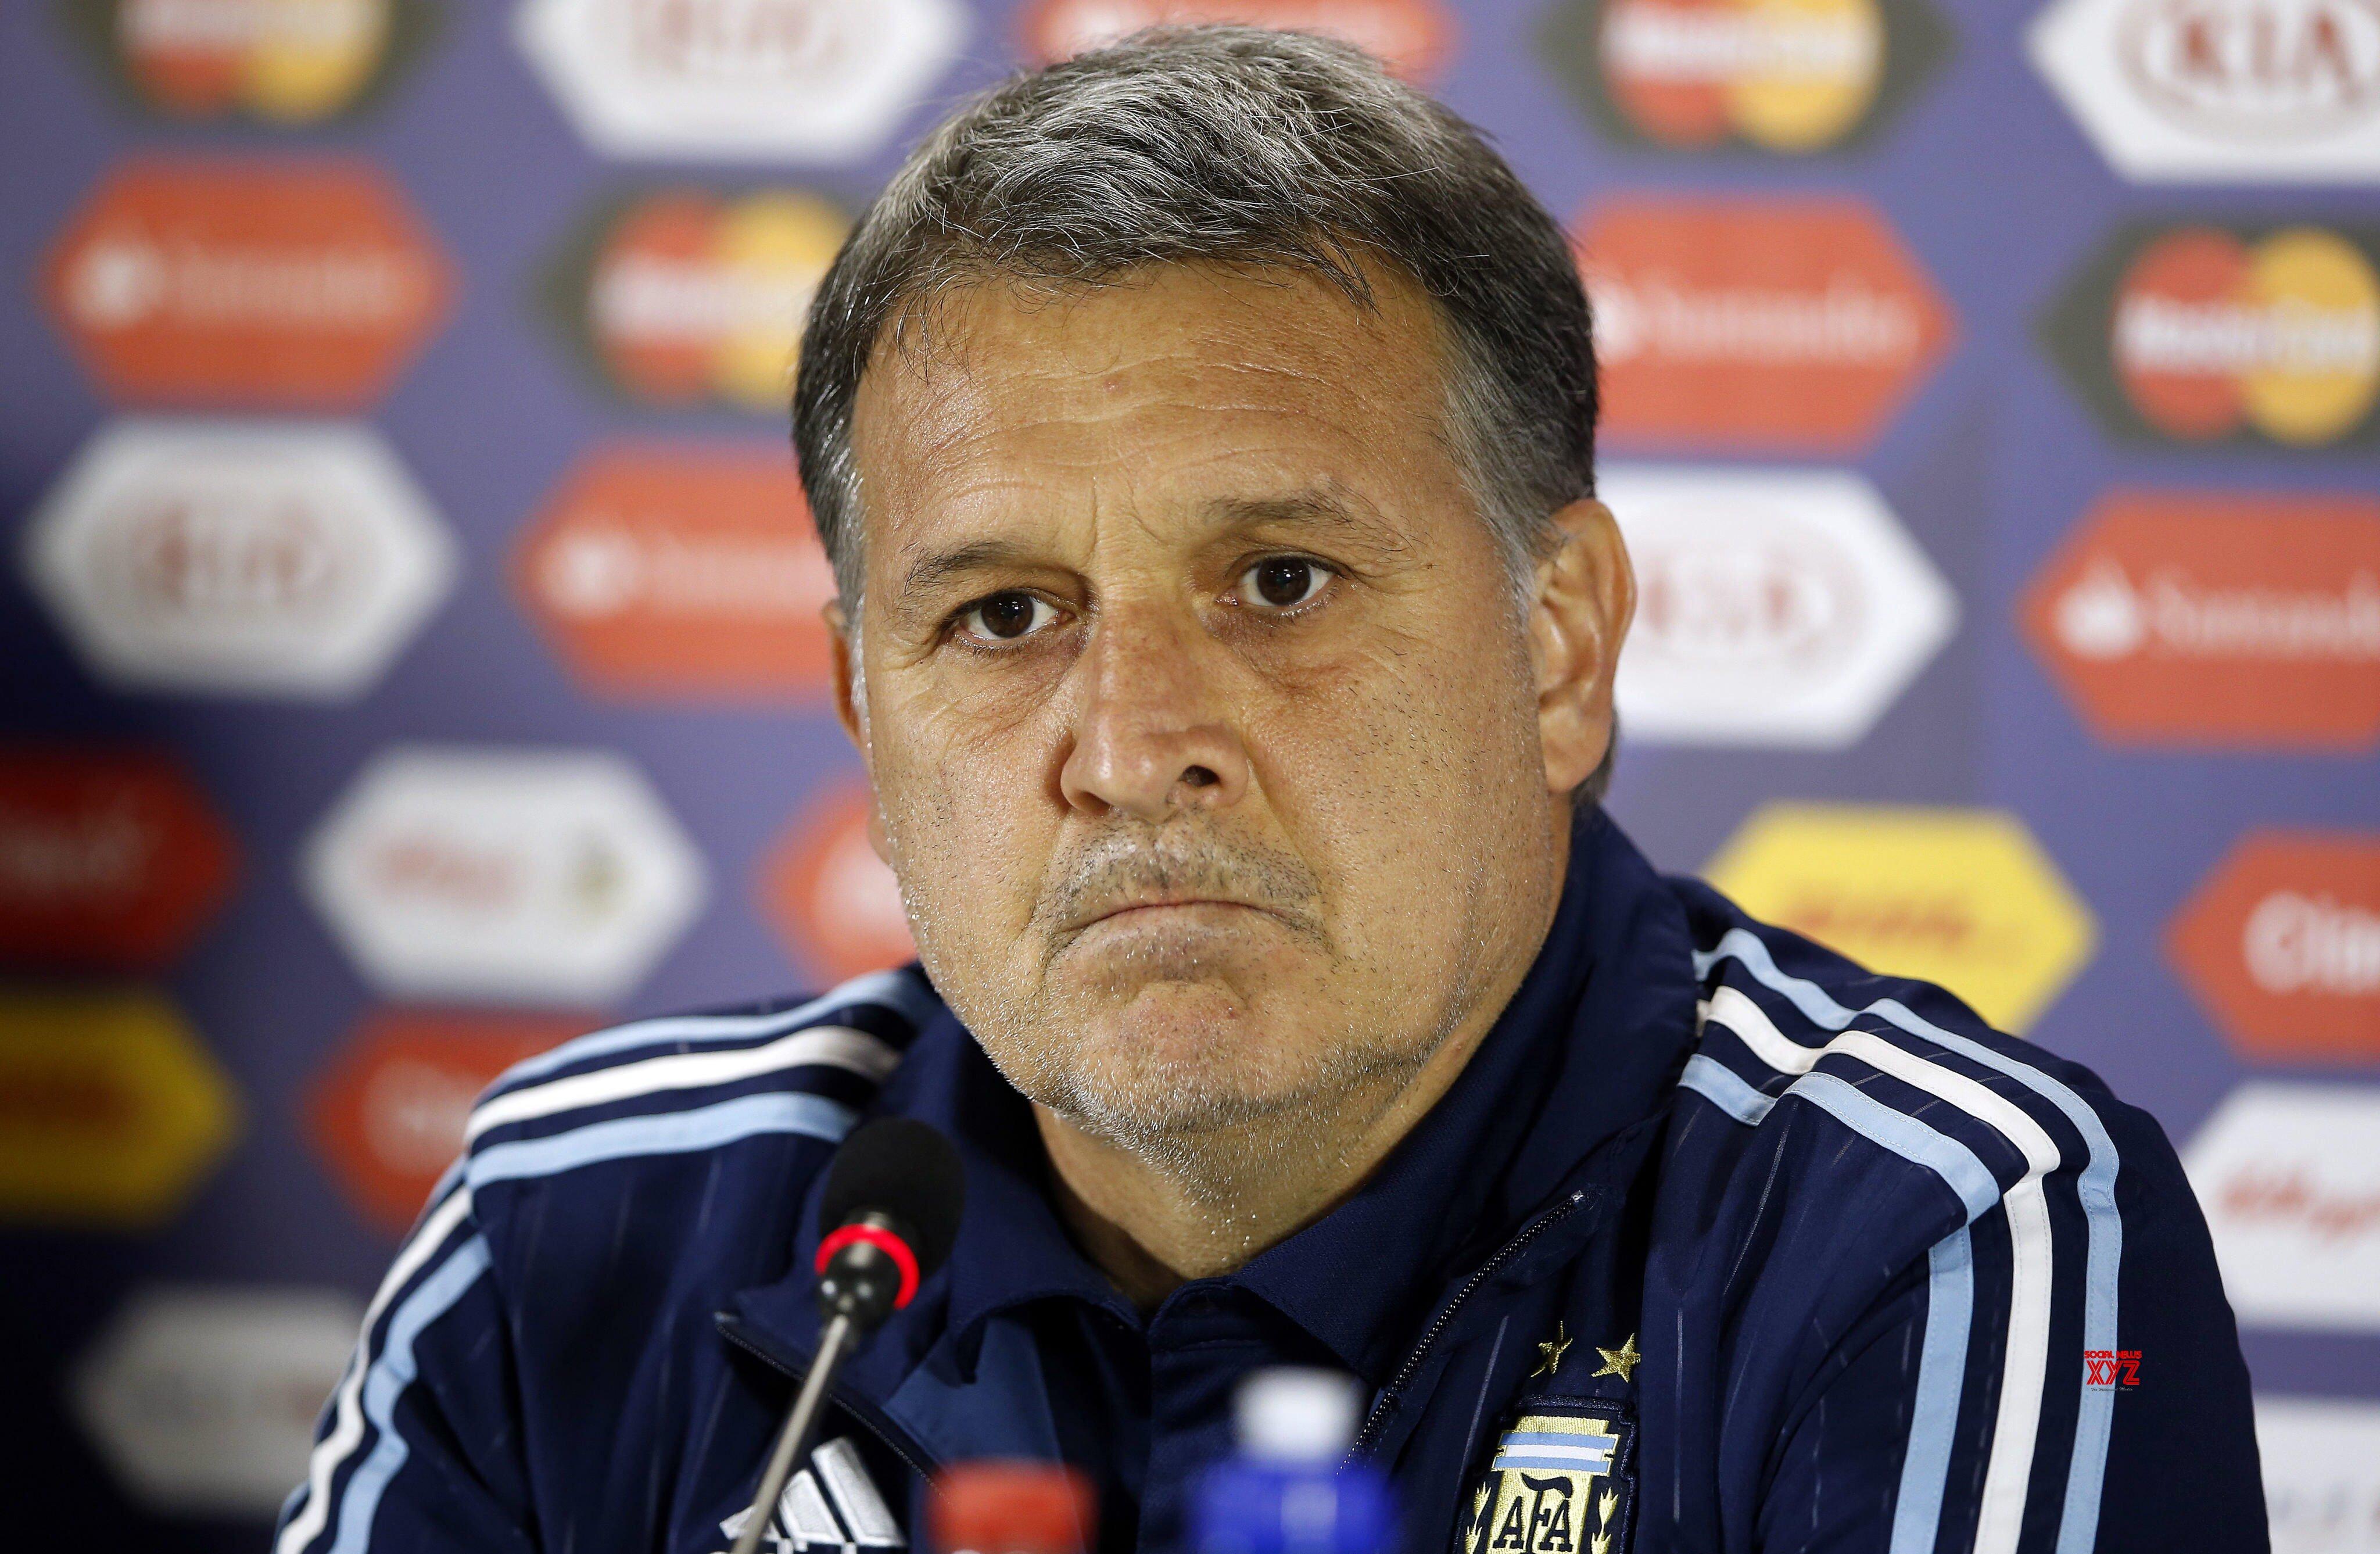 Gerardo Martino hints at new faces in Mexico squad